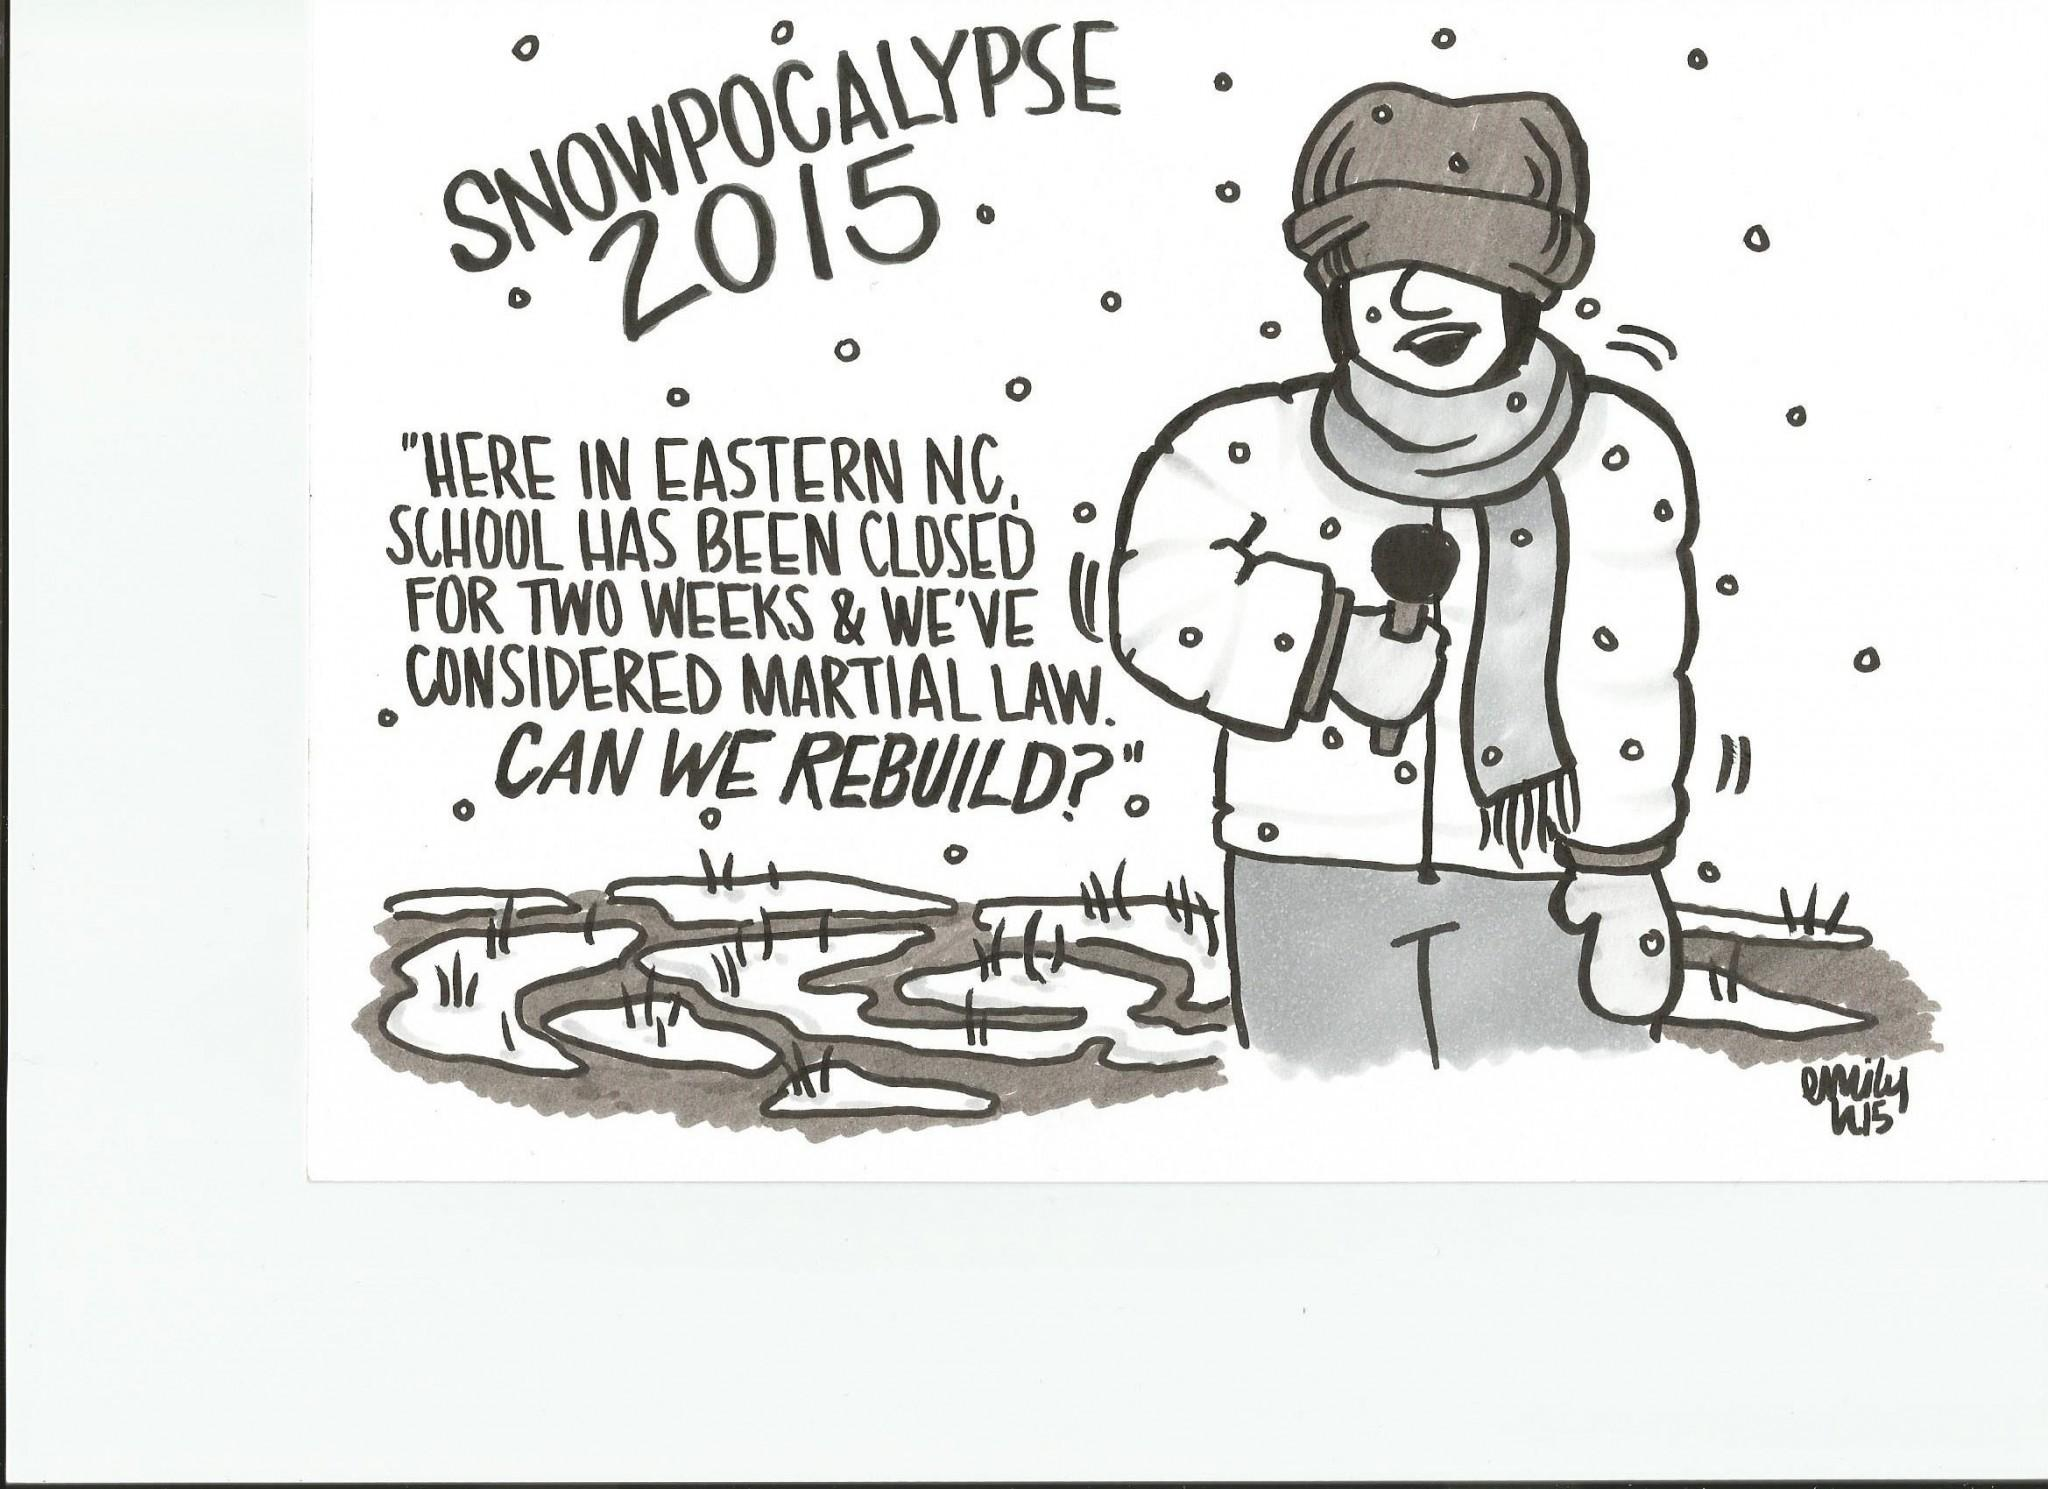 Cartoon: Snowpocalypse 2015